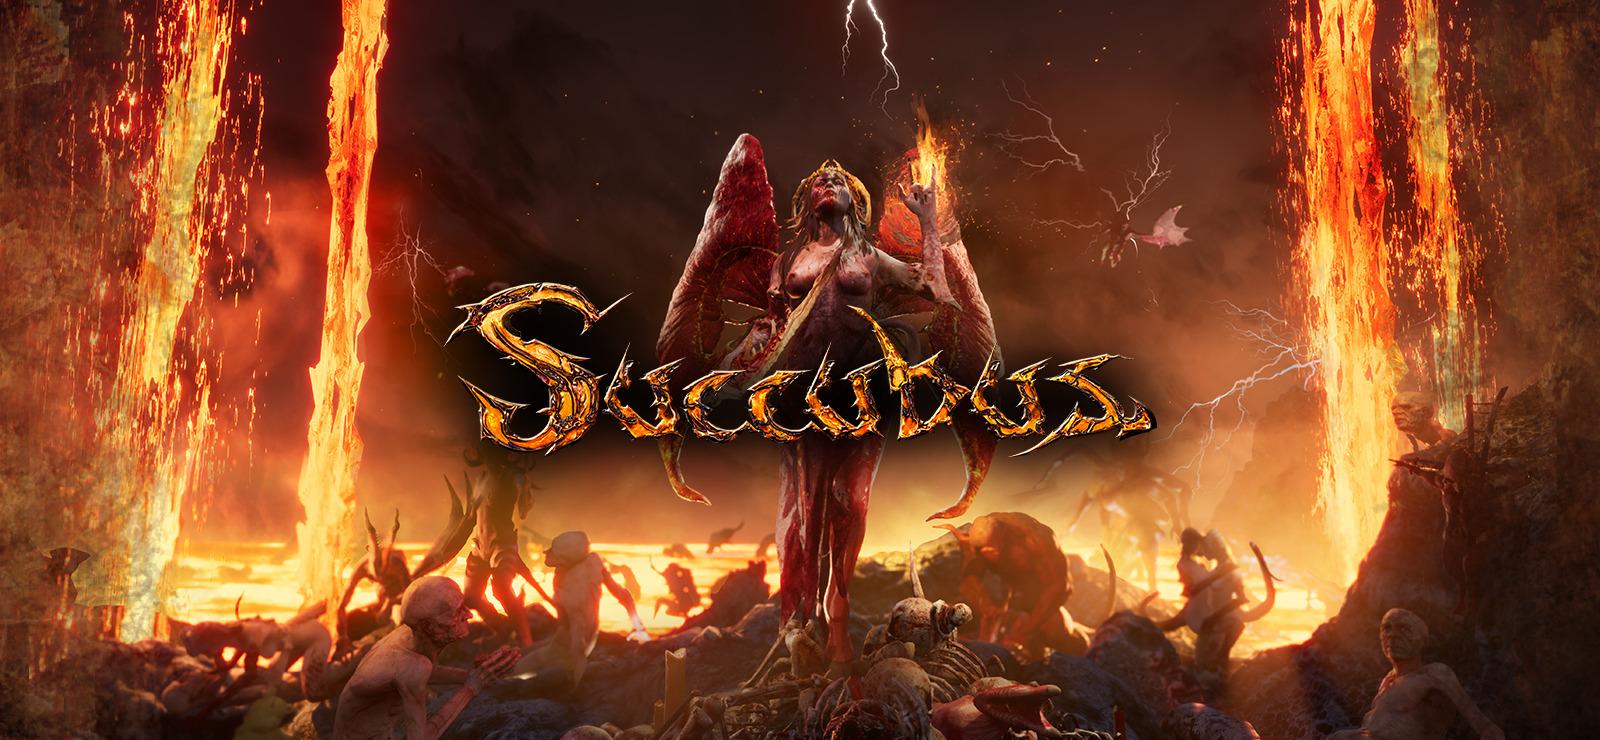 Succubus Free Download